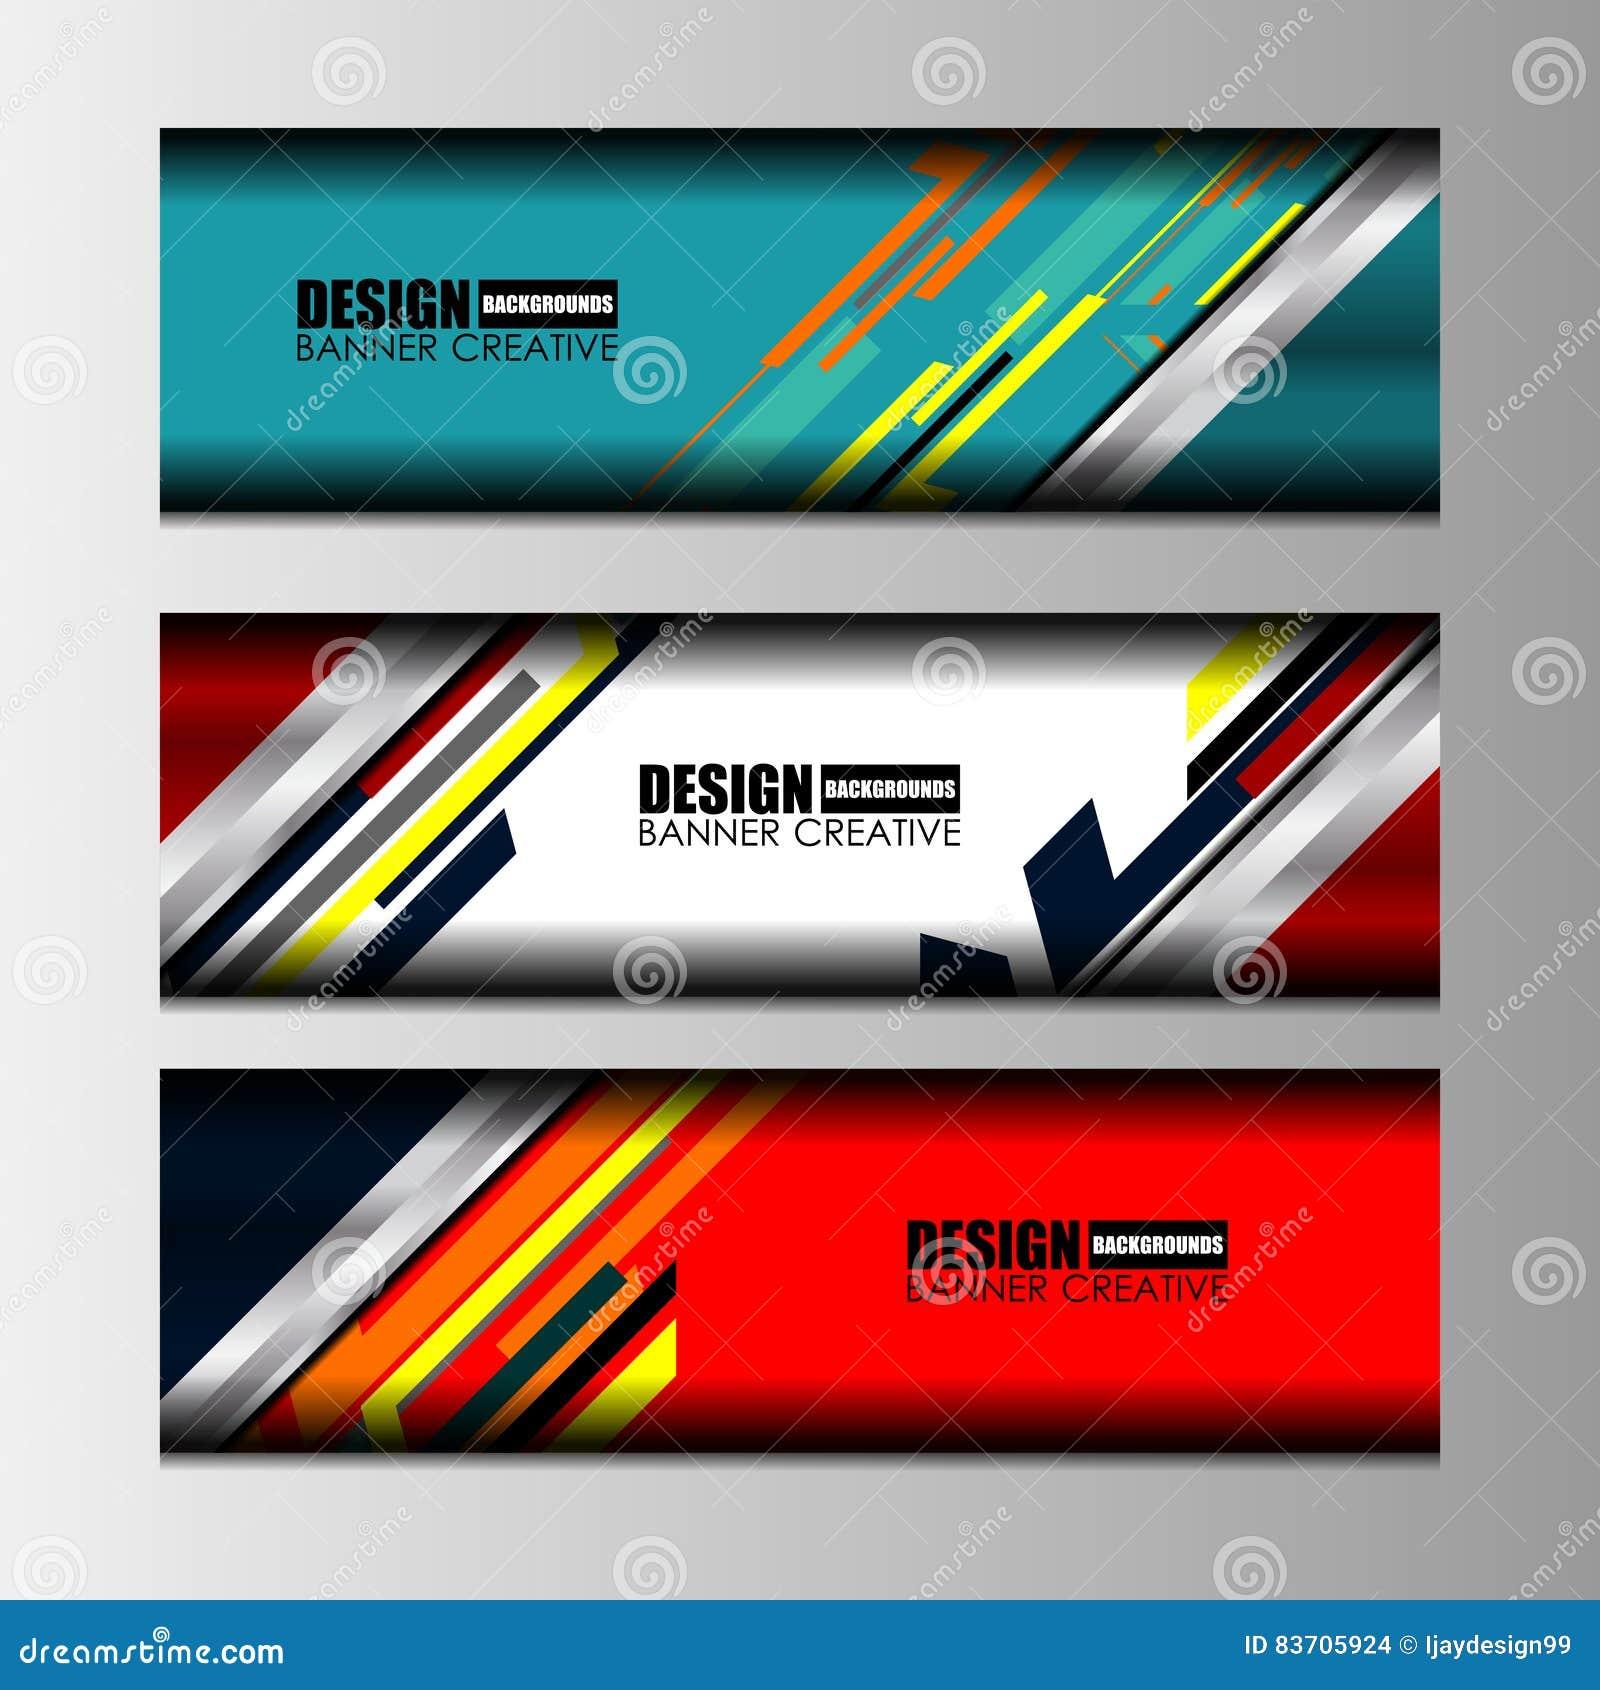 Web Banners Design Stock Vector